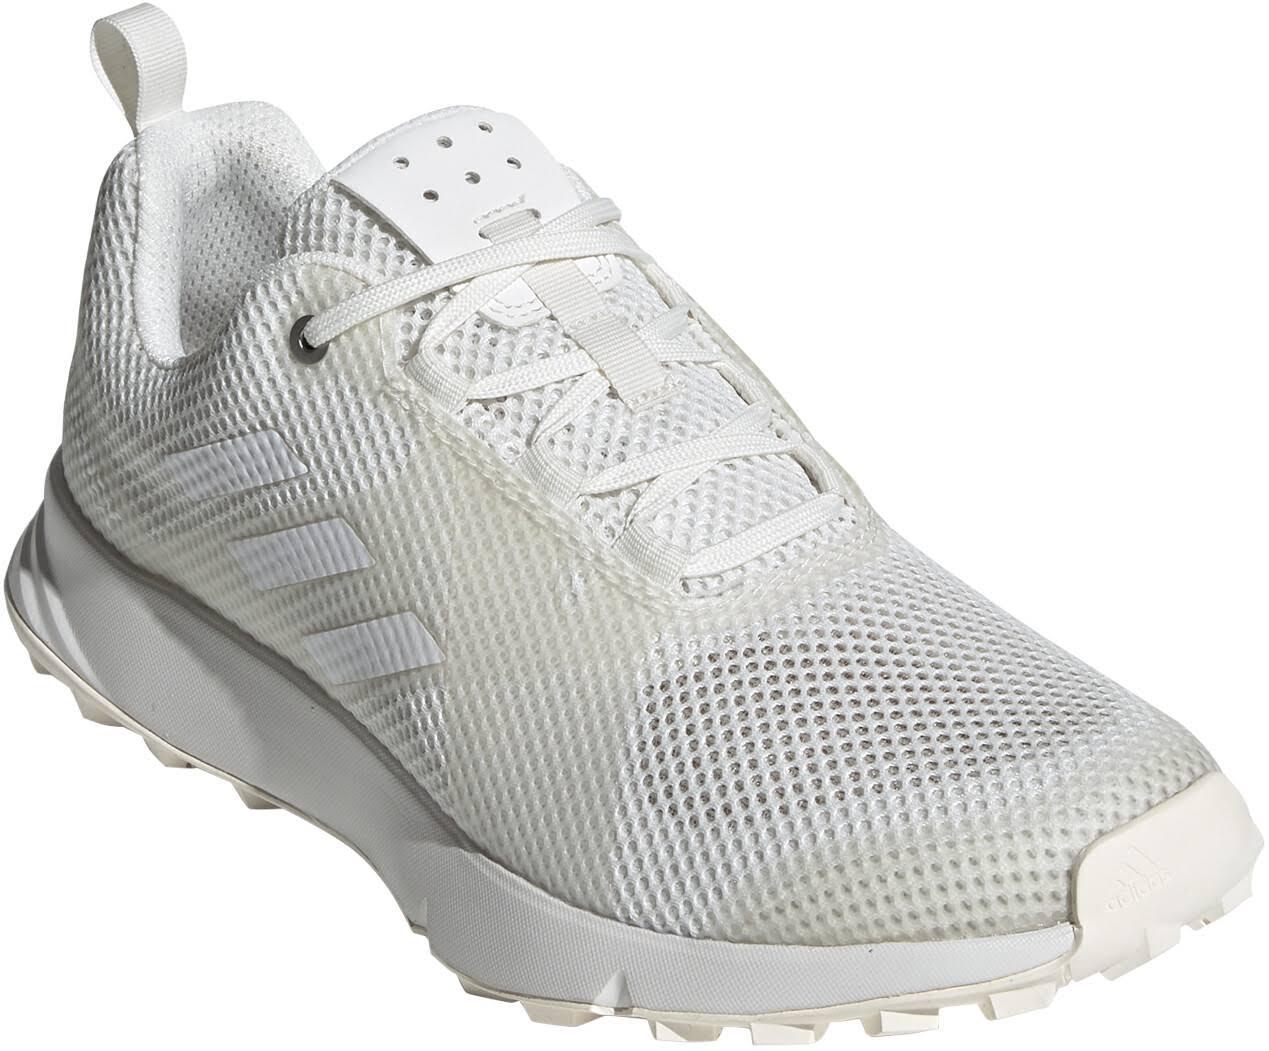 Adidas Terrex Two Shoes Women Non dyed/footwear White/ UK 6,5, EU